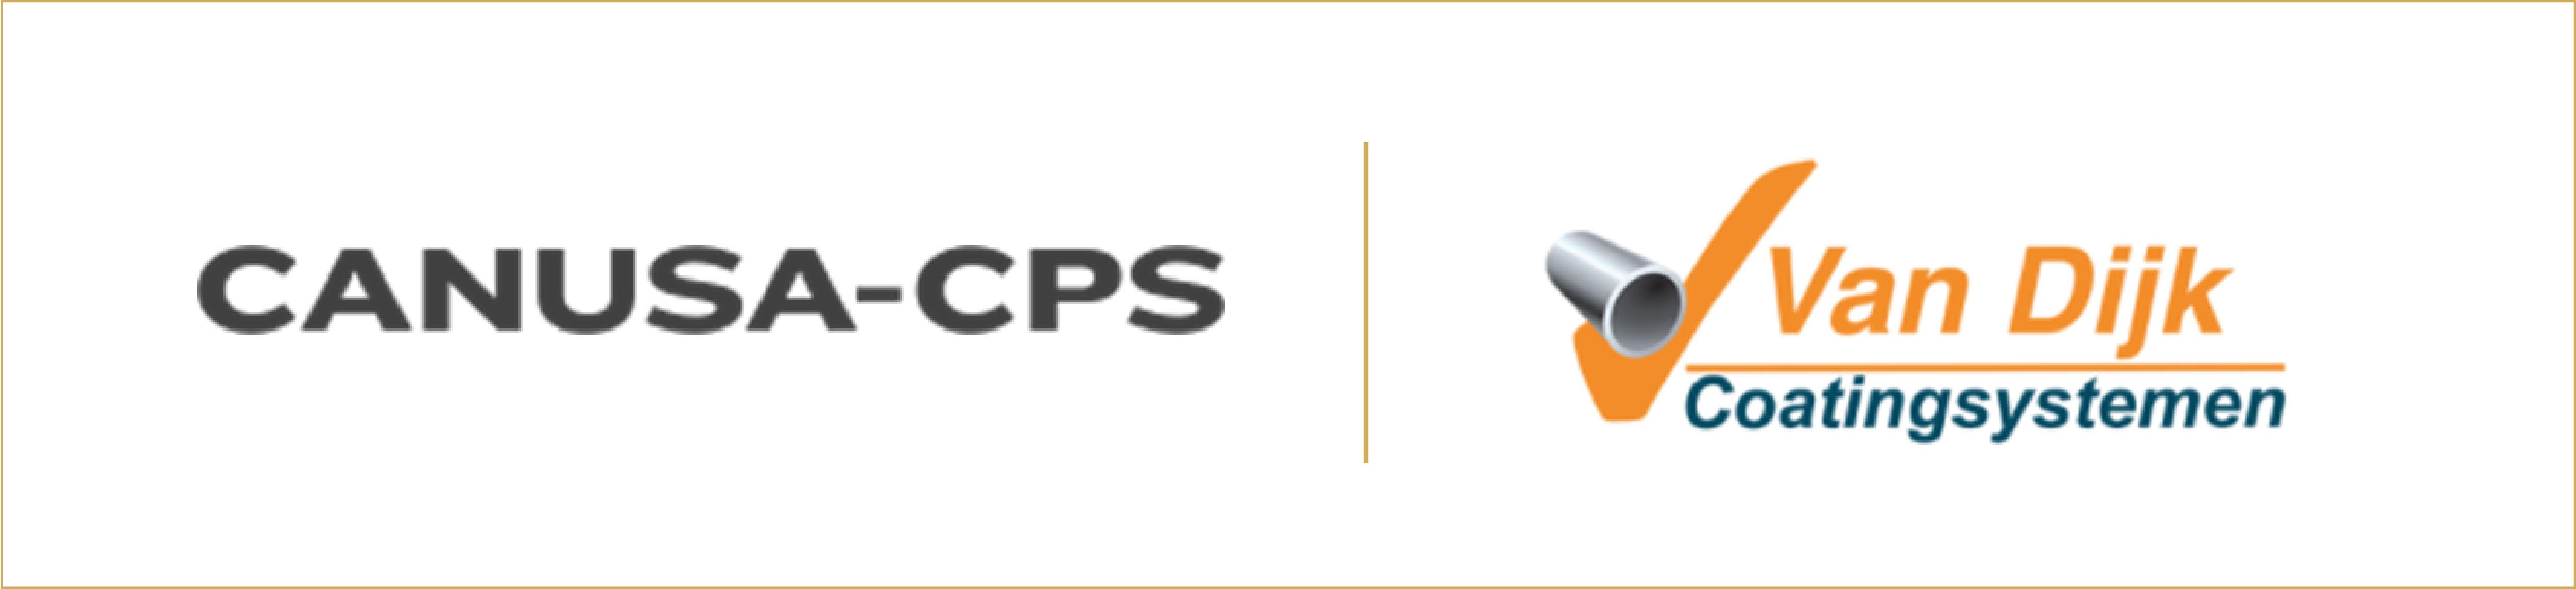 VDC_Canusa_PIP_logos